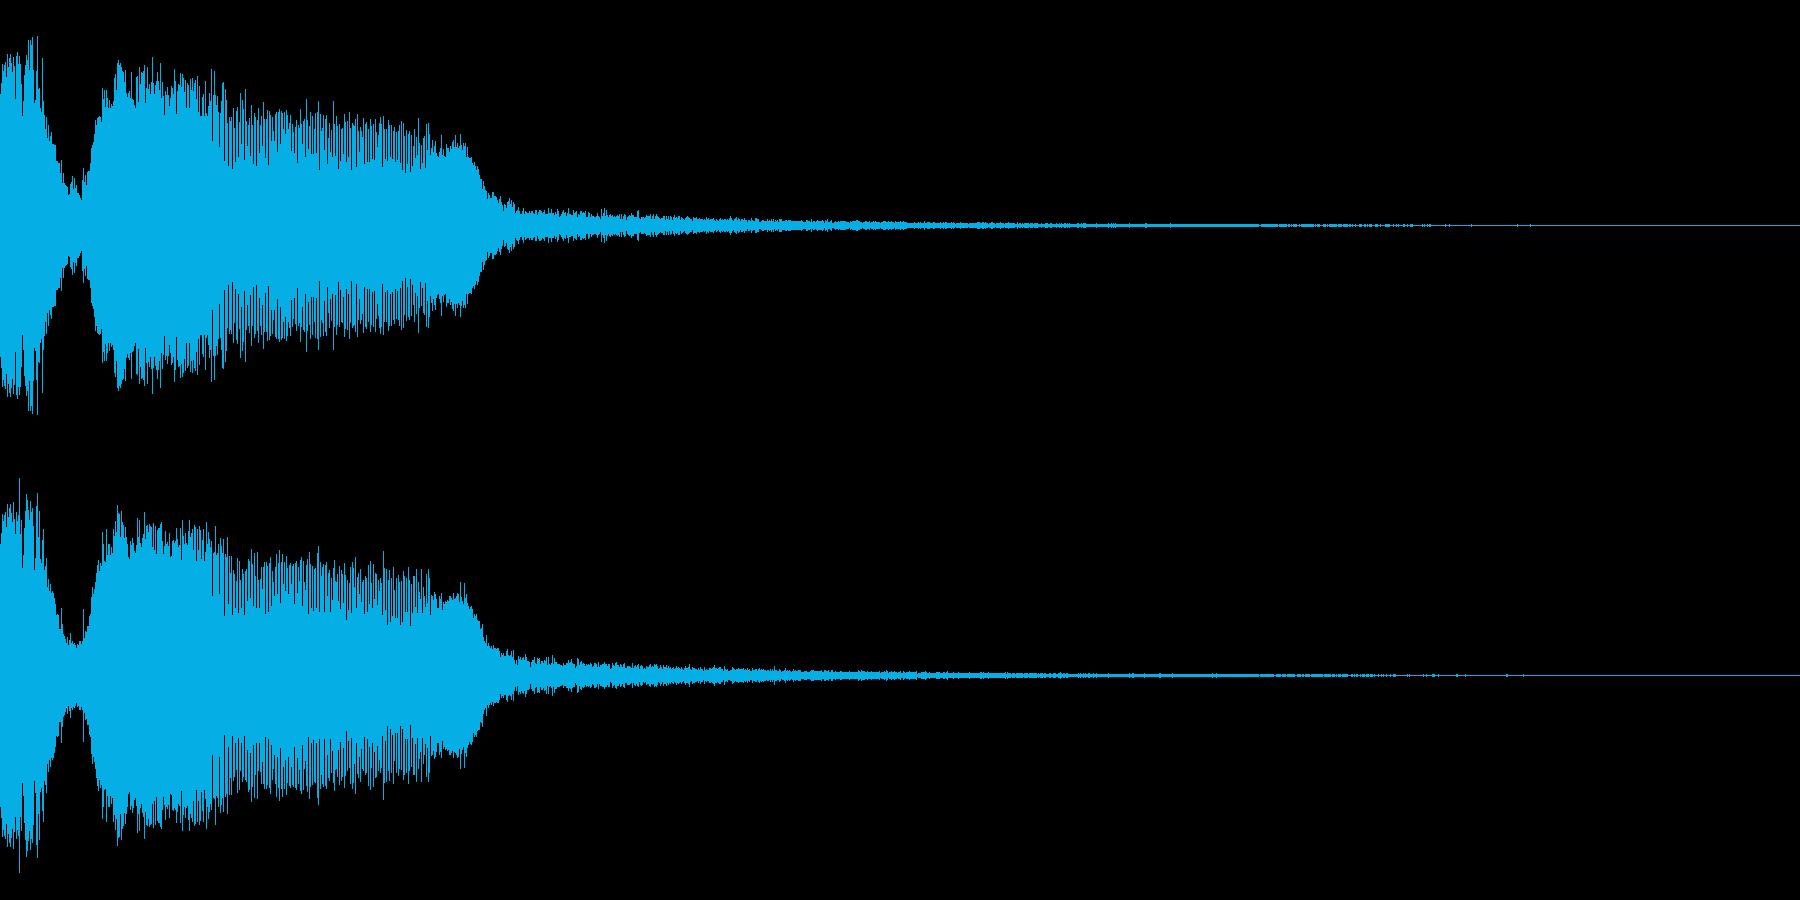 DJFX ヒットチャート発表前SE 12の再生済みの波形